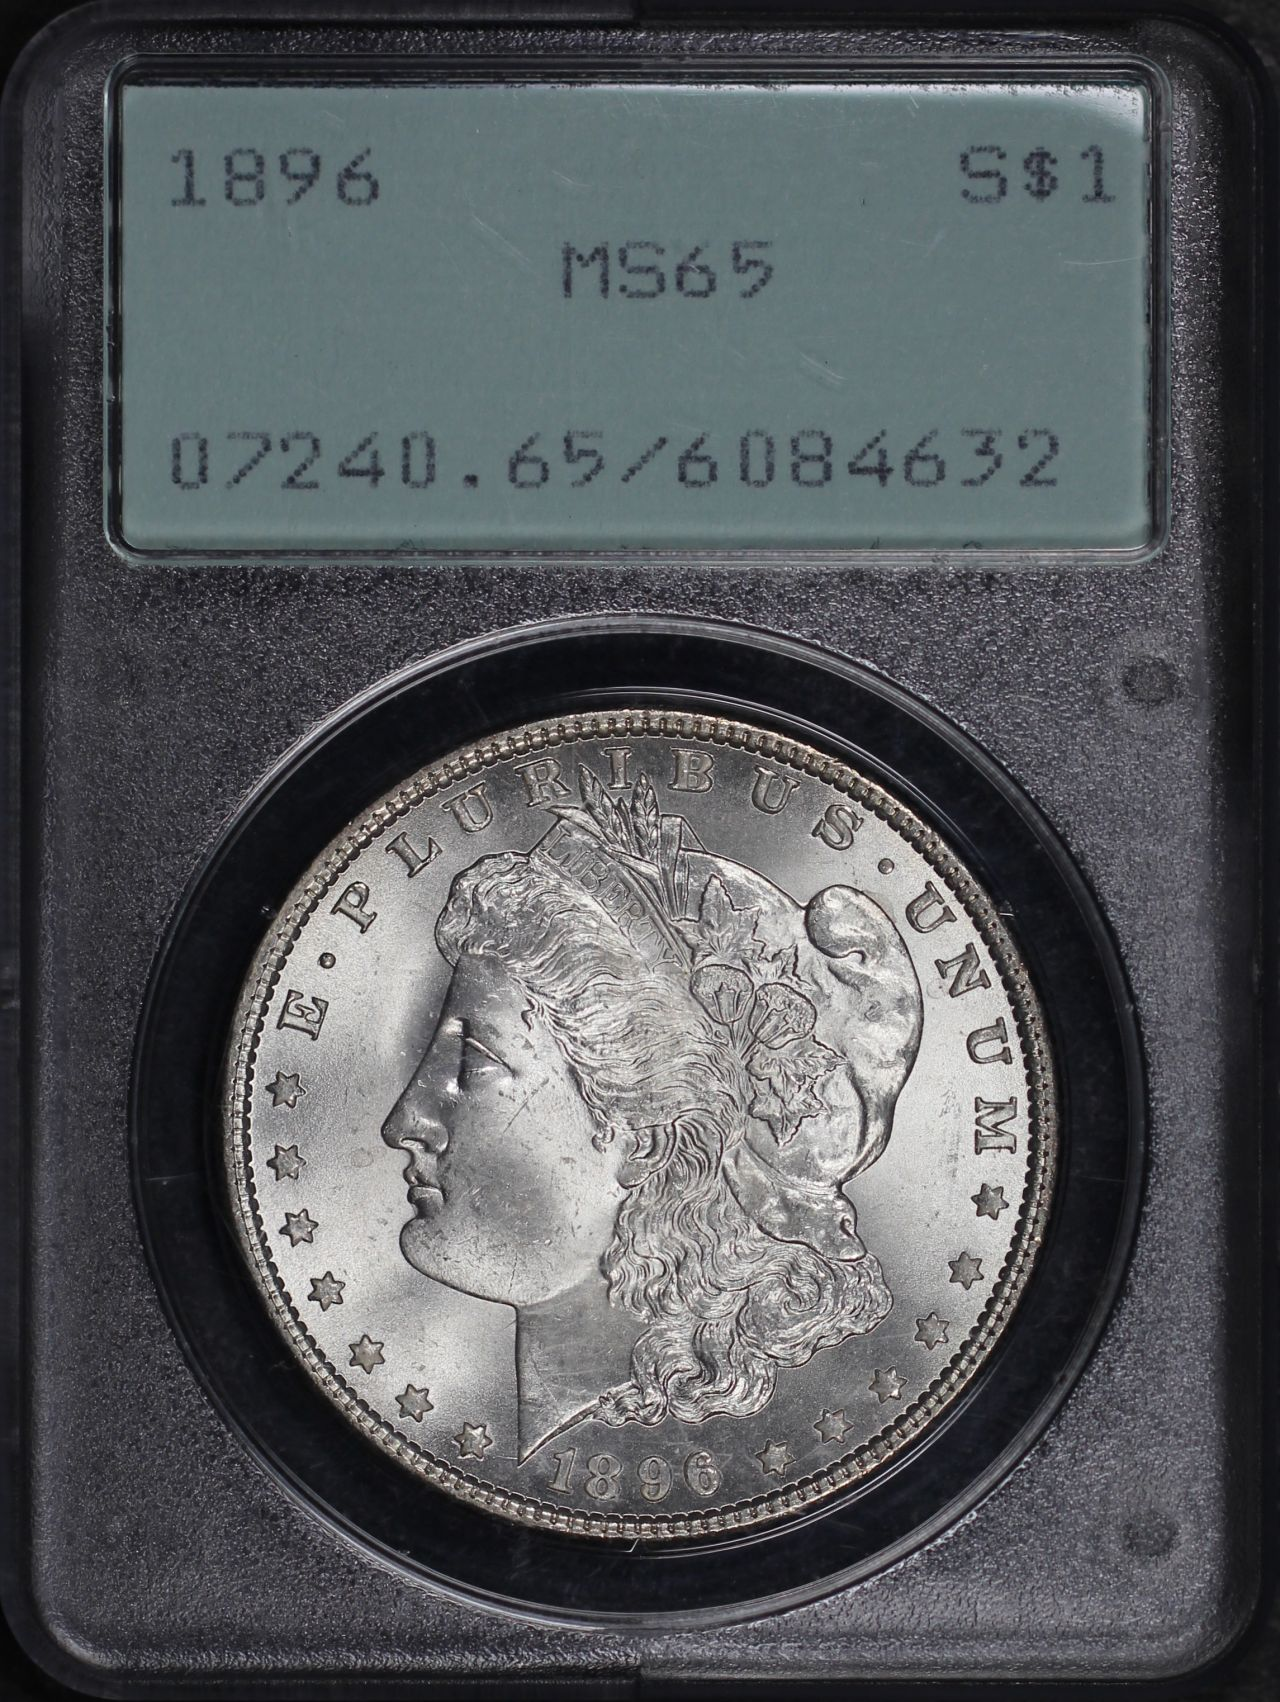 Obverse of this 1896 Morgan Dollar PCGS MS-65